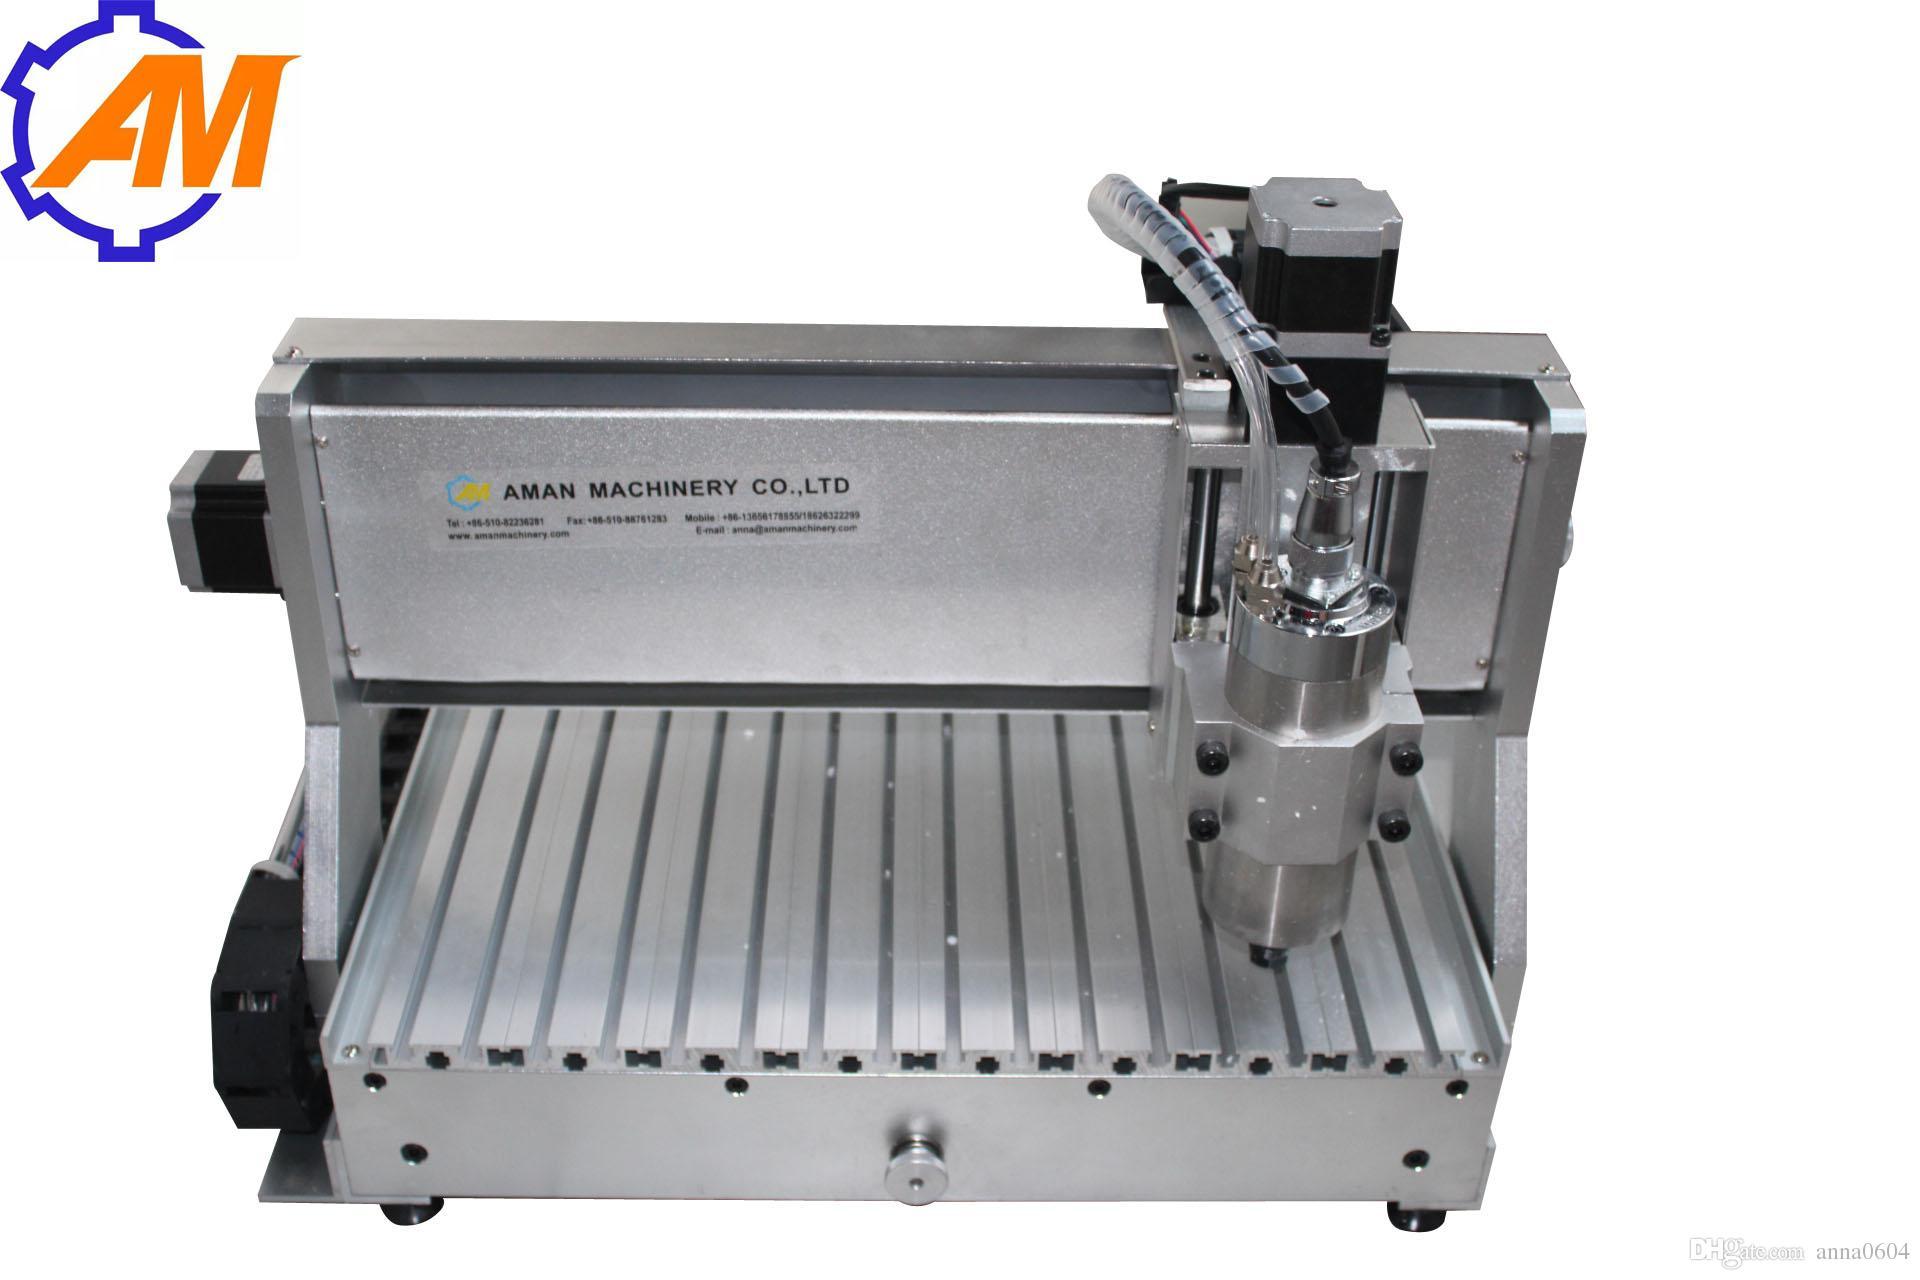 Am 6040ch80 Good Quality Cnc Milling Machine Jpg